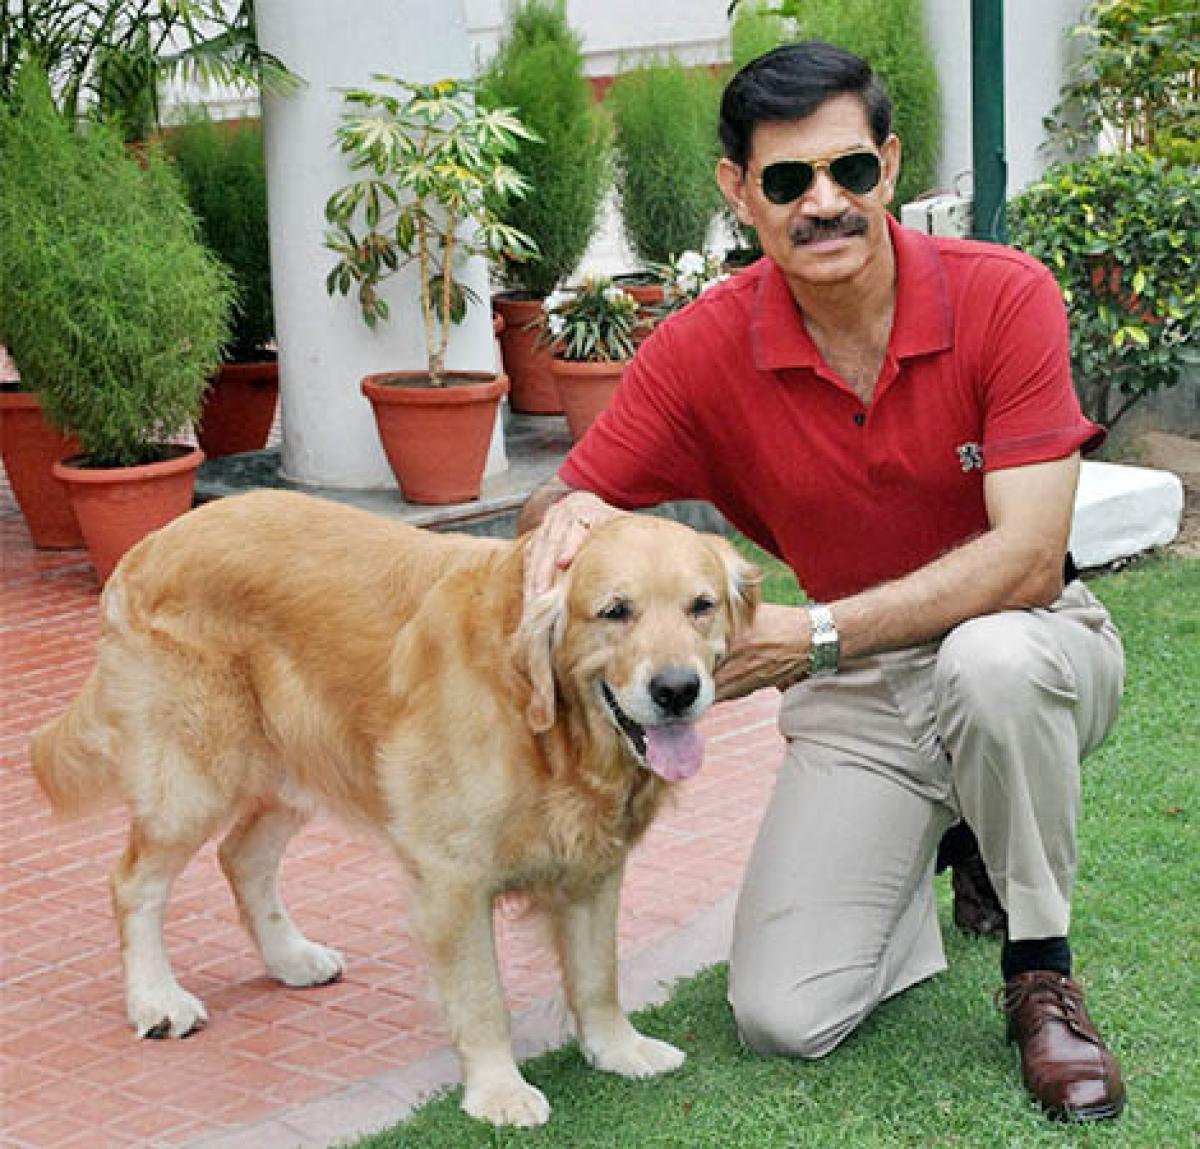 Army chief General Dalbir Singh with his pet 'Juno' in New Delhi recently.